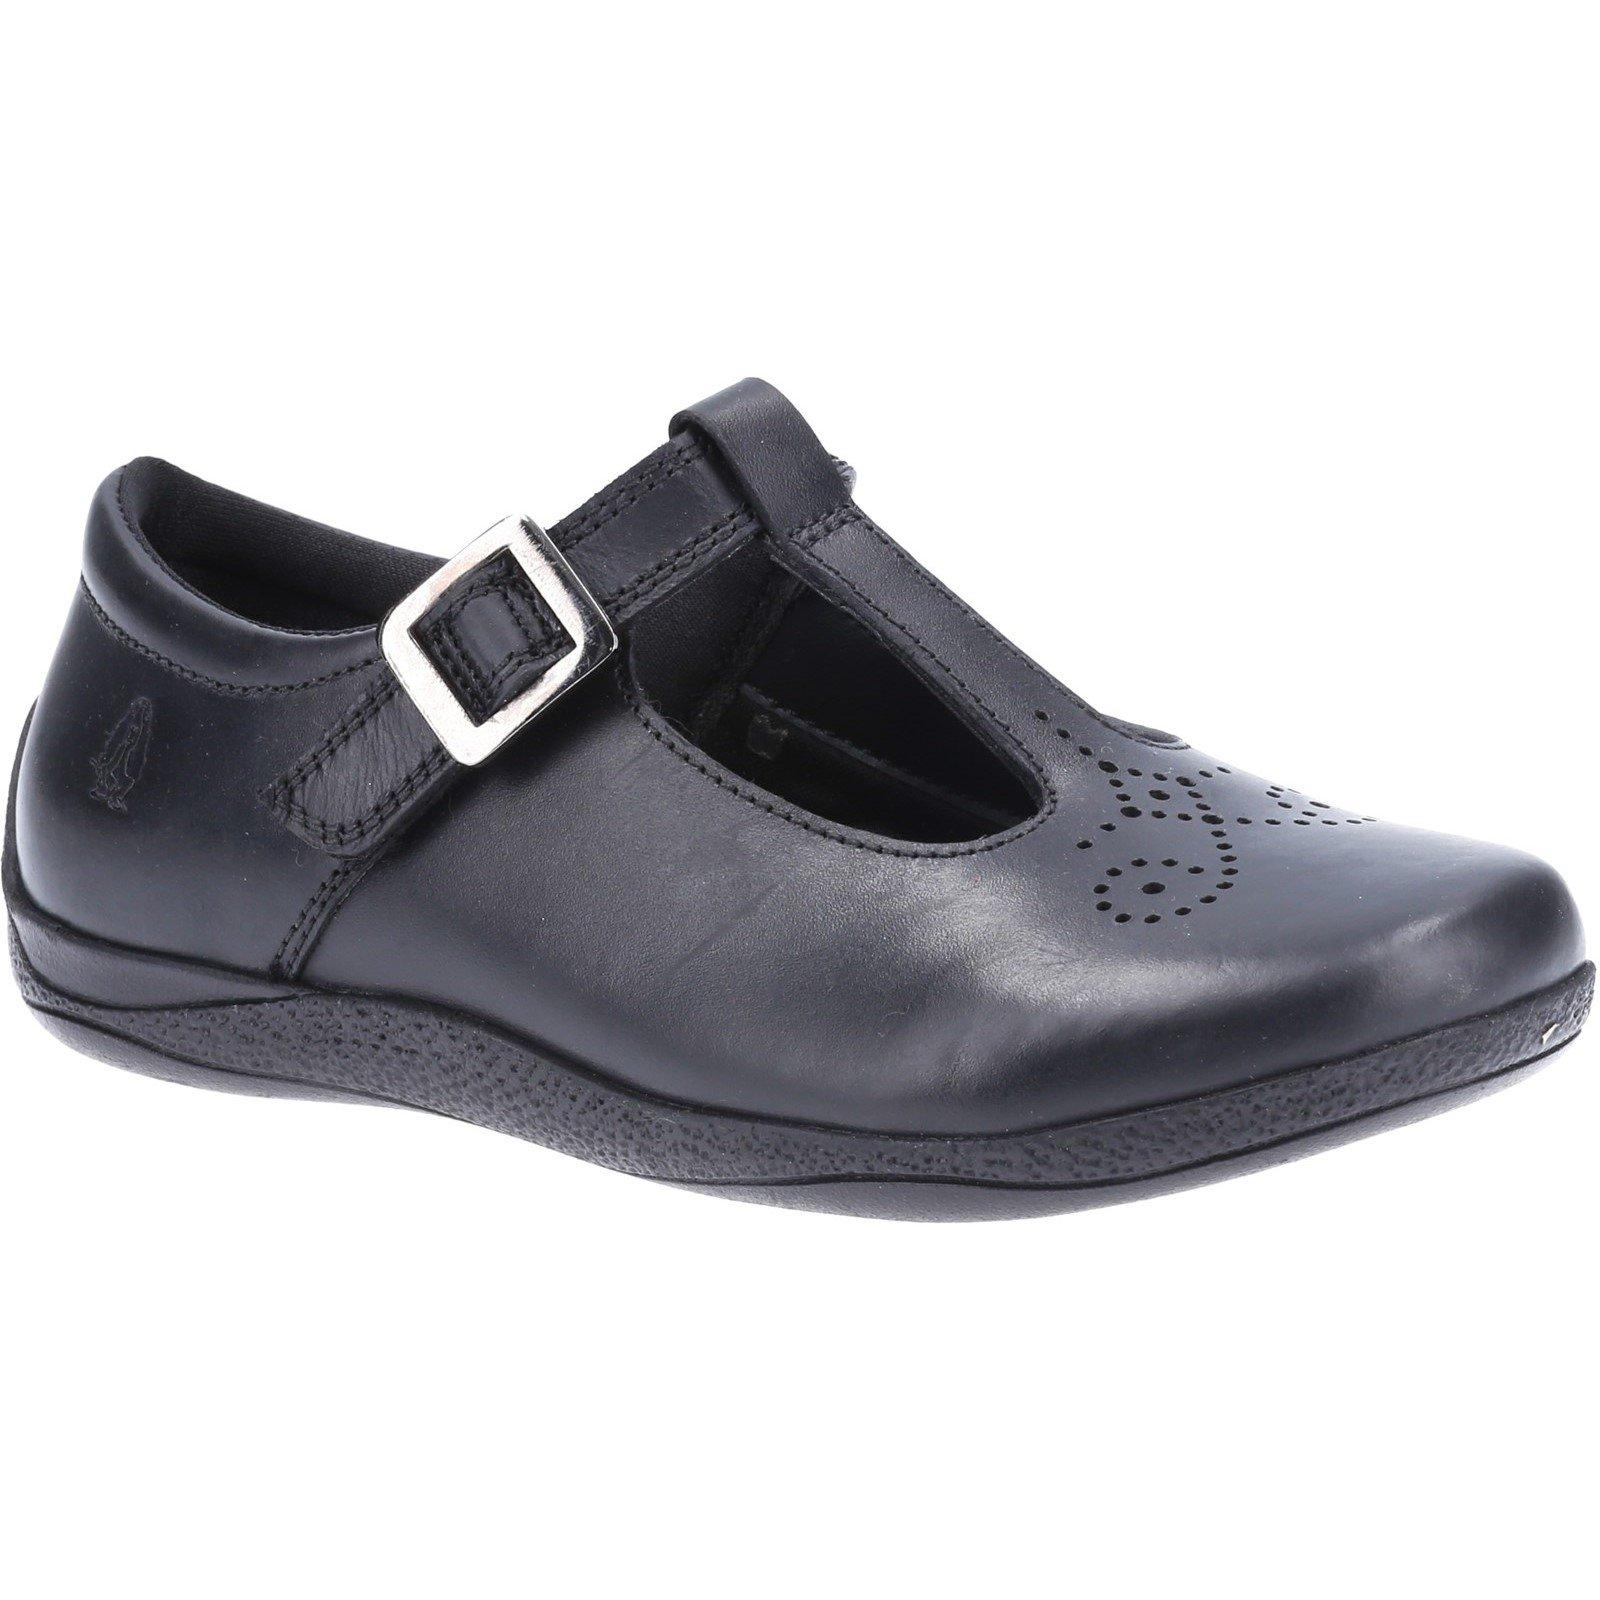 Hush Puppies Kid's Eliza Senior School Shoe Black 32590 - Black 5